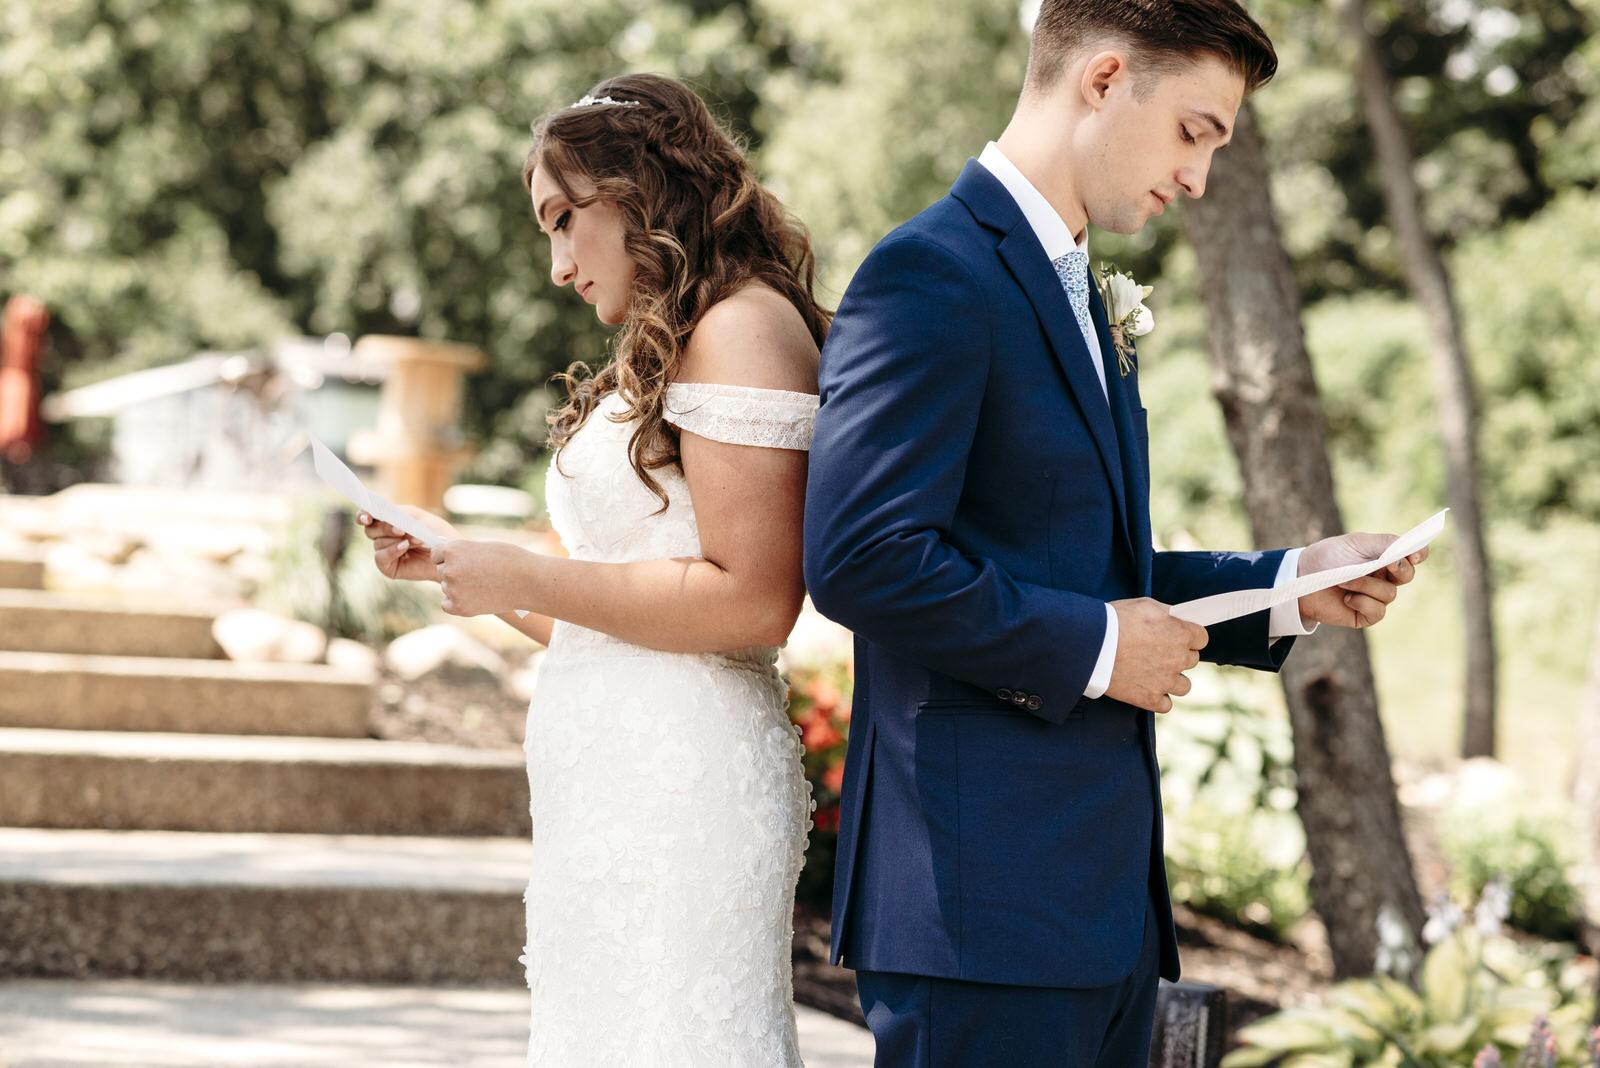 Birchview-Event-Center-Wedding-Michigan-wedding-photographer-Captured-Couture-LLC-63